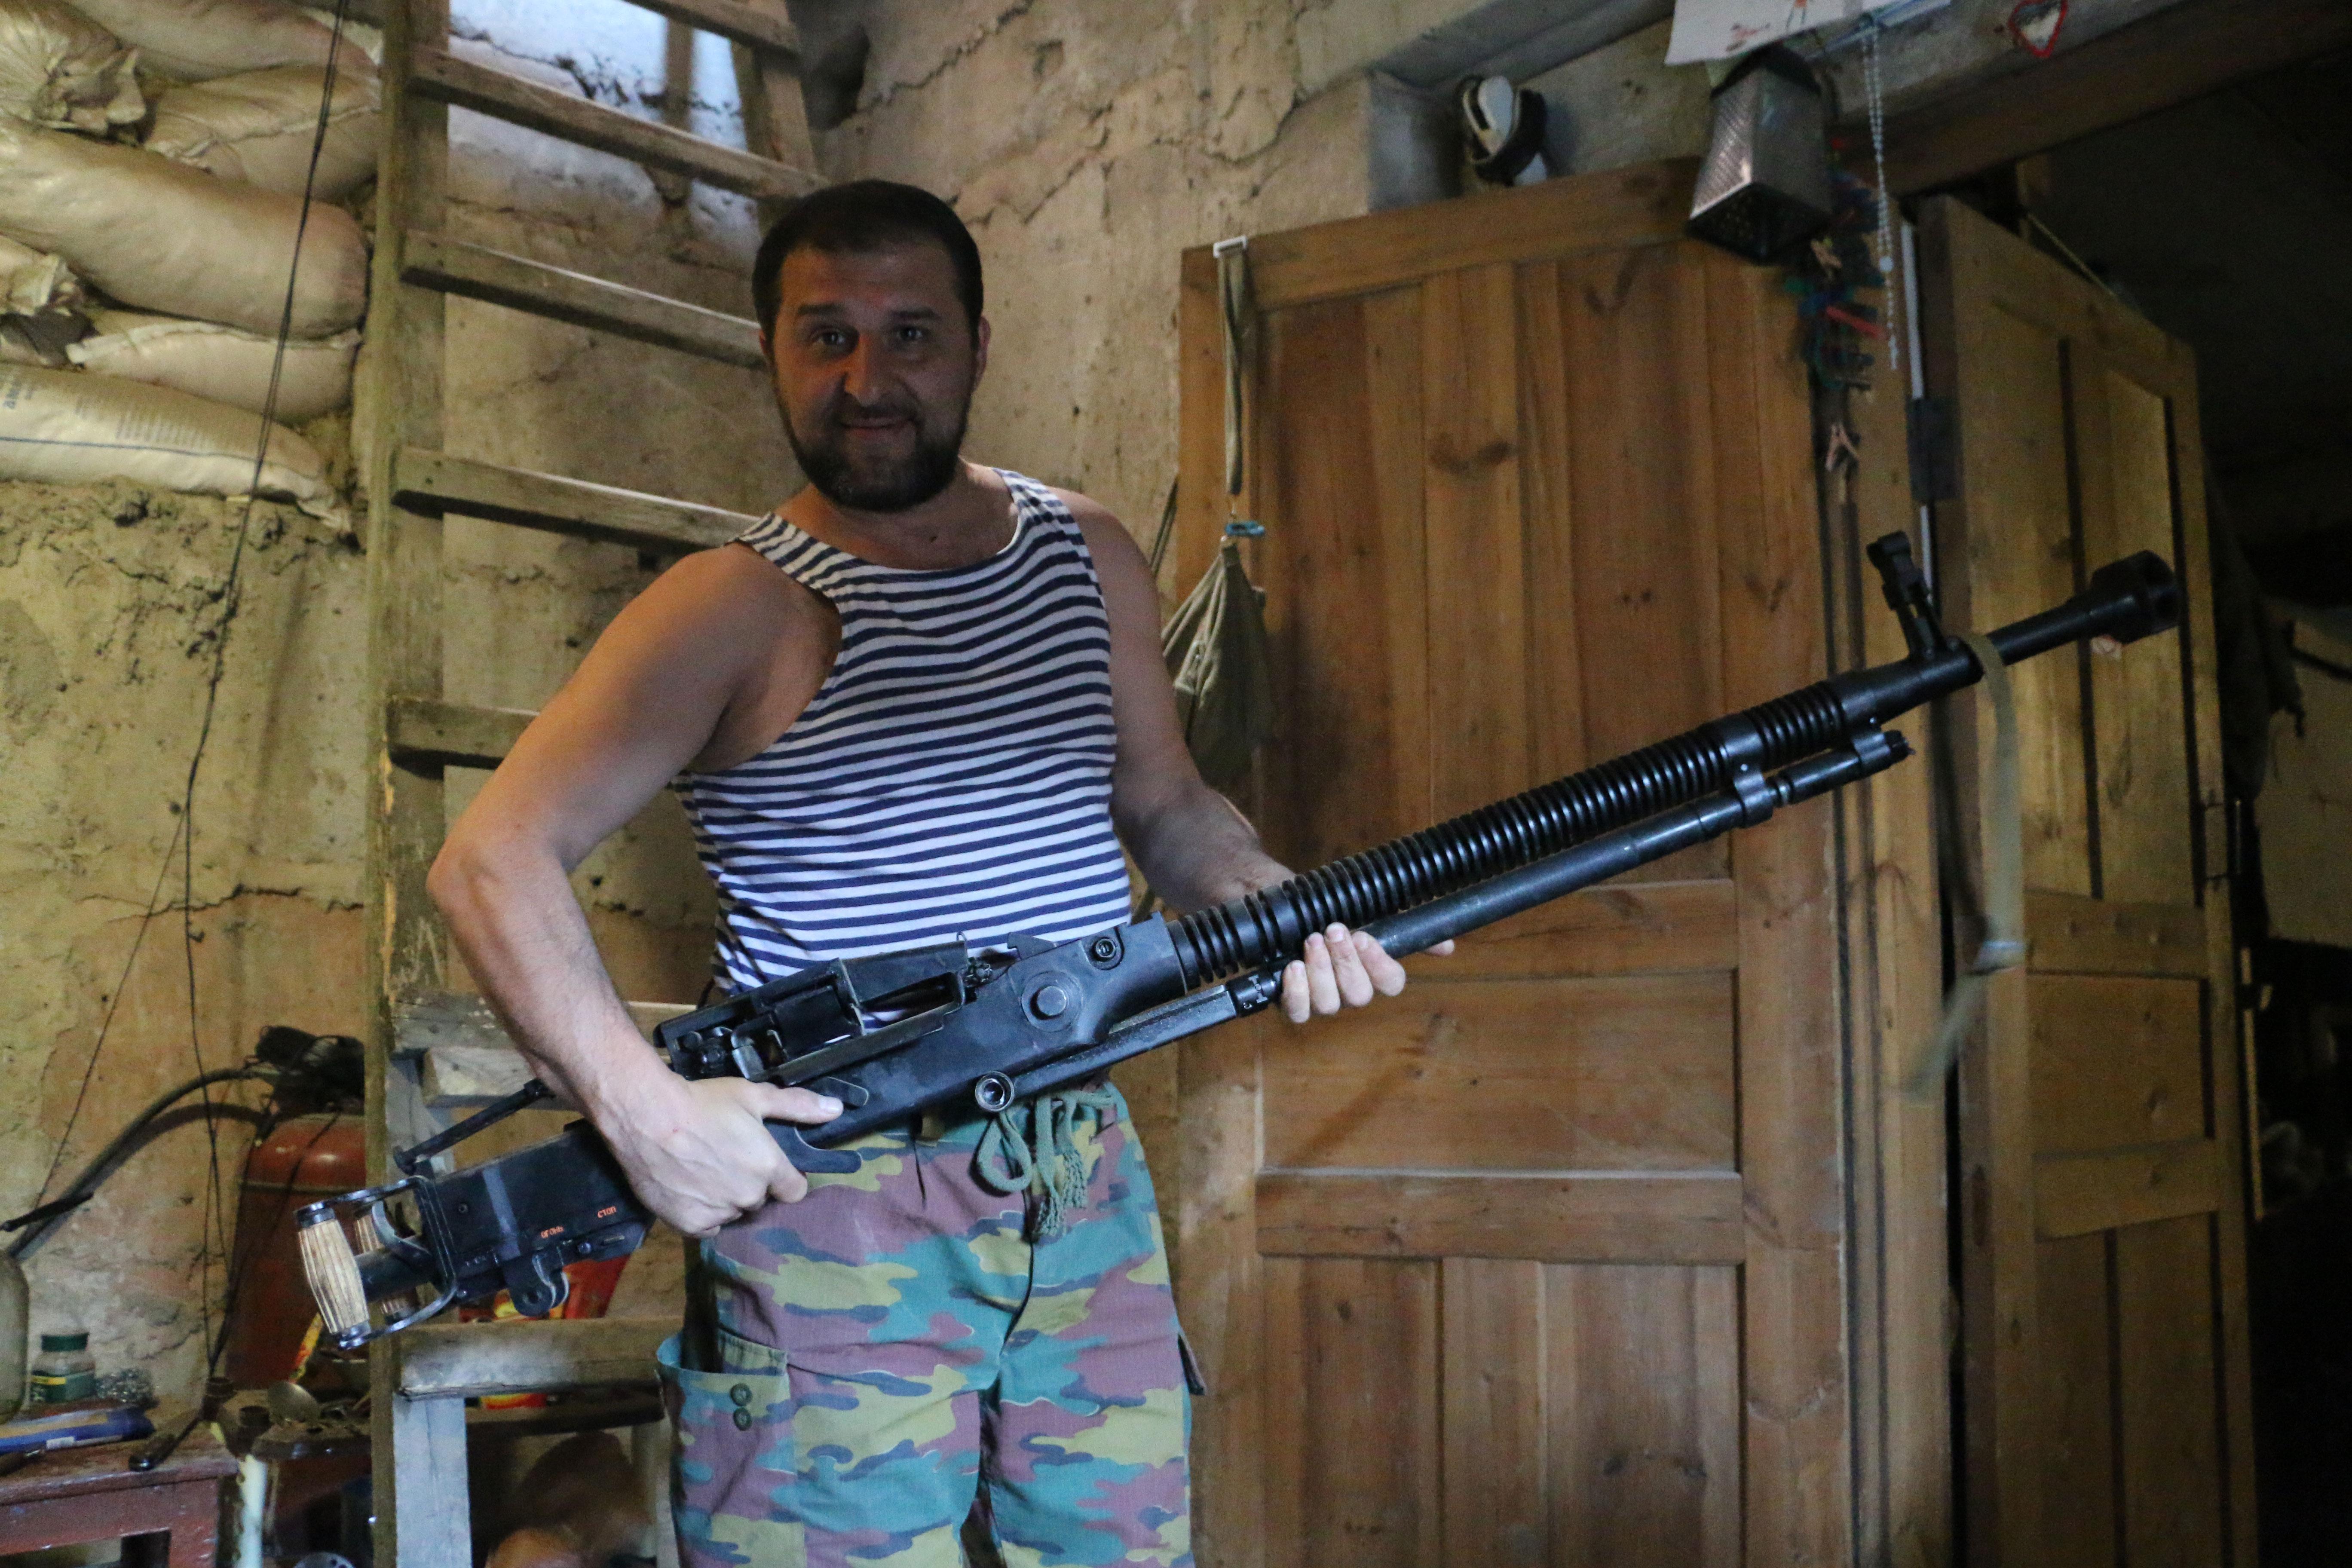 Ukrainian troops use surplus Soviet weapons on the front lines in eastern Ukraine.